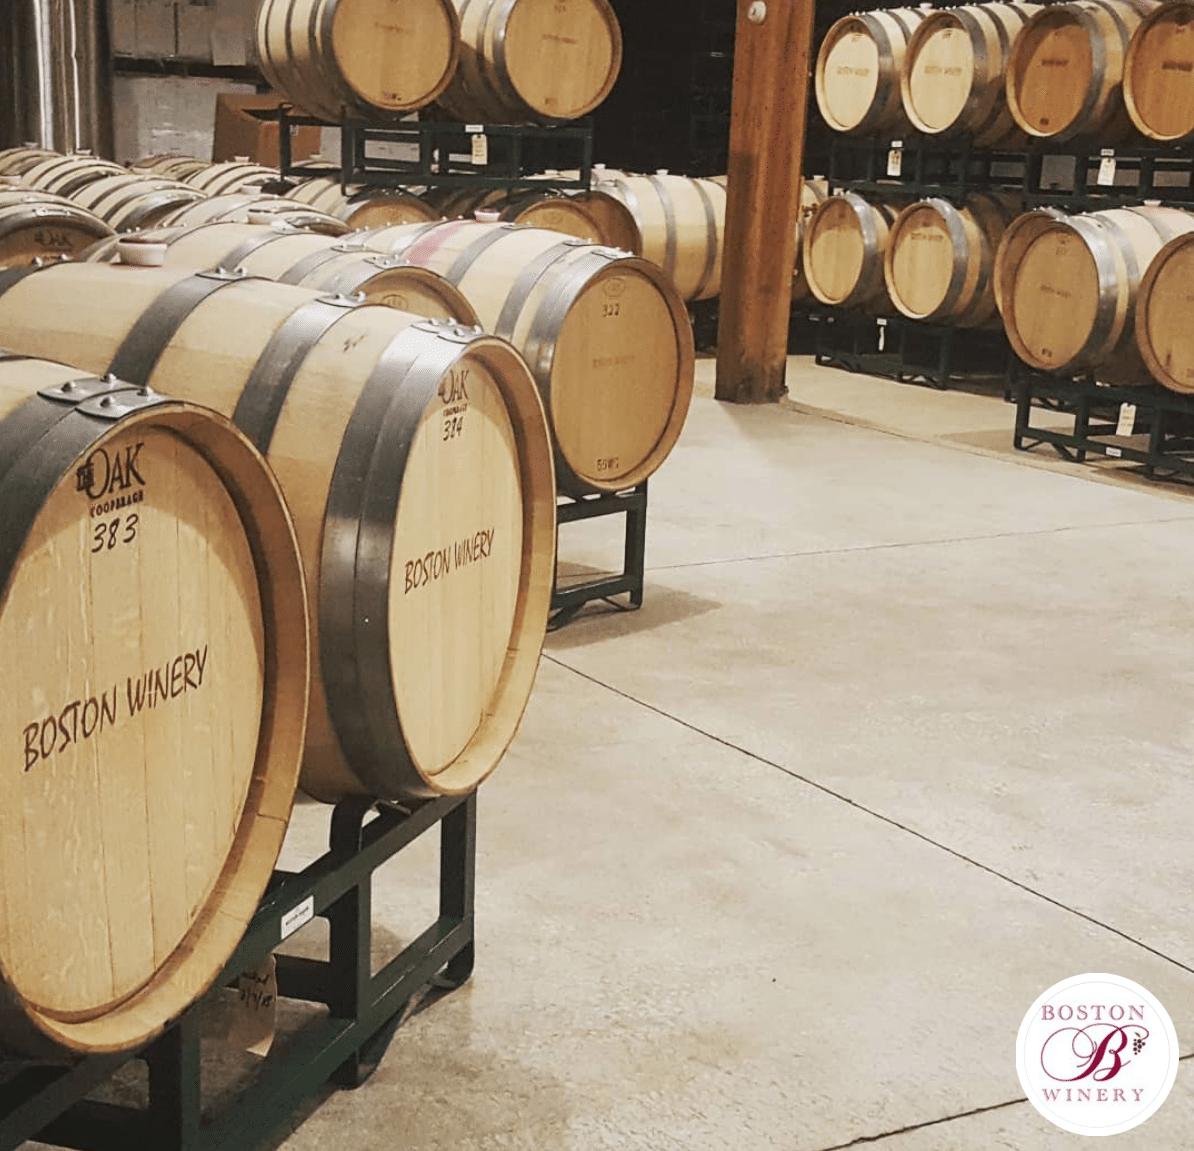 Boston Winery Barrel Room